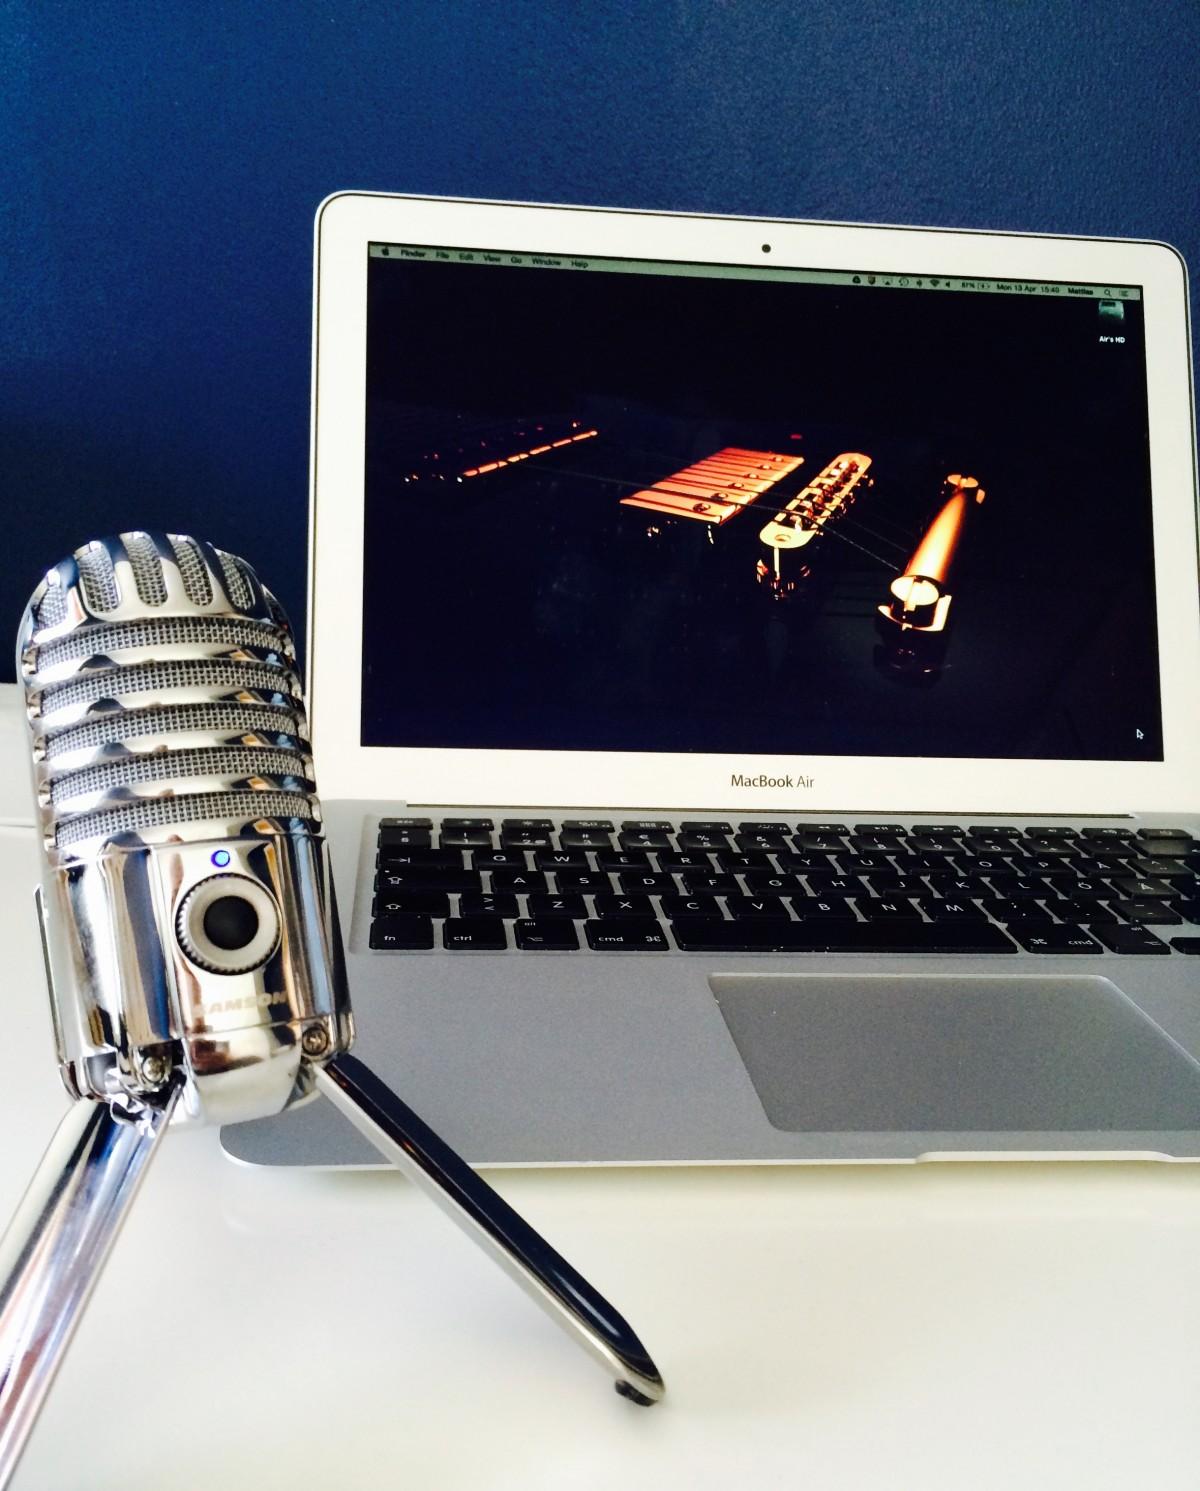 Samson Meteor and MacBook Air in sweet harmony